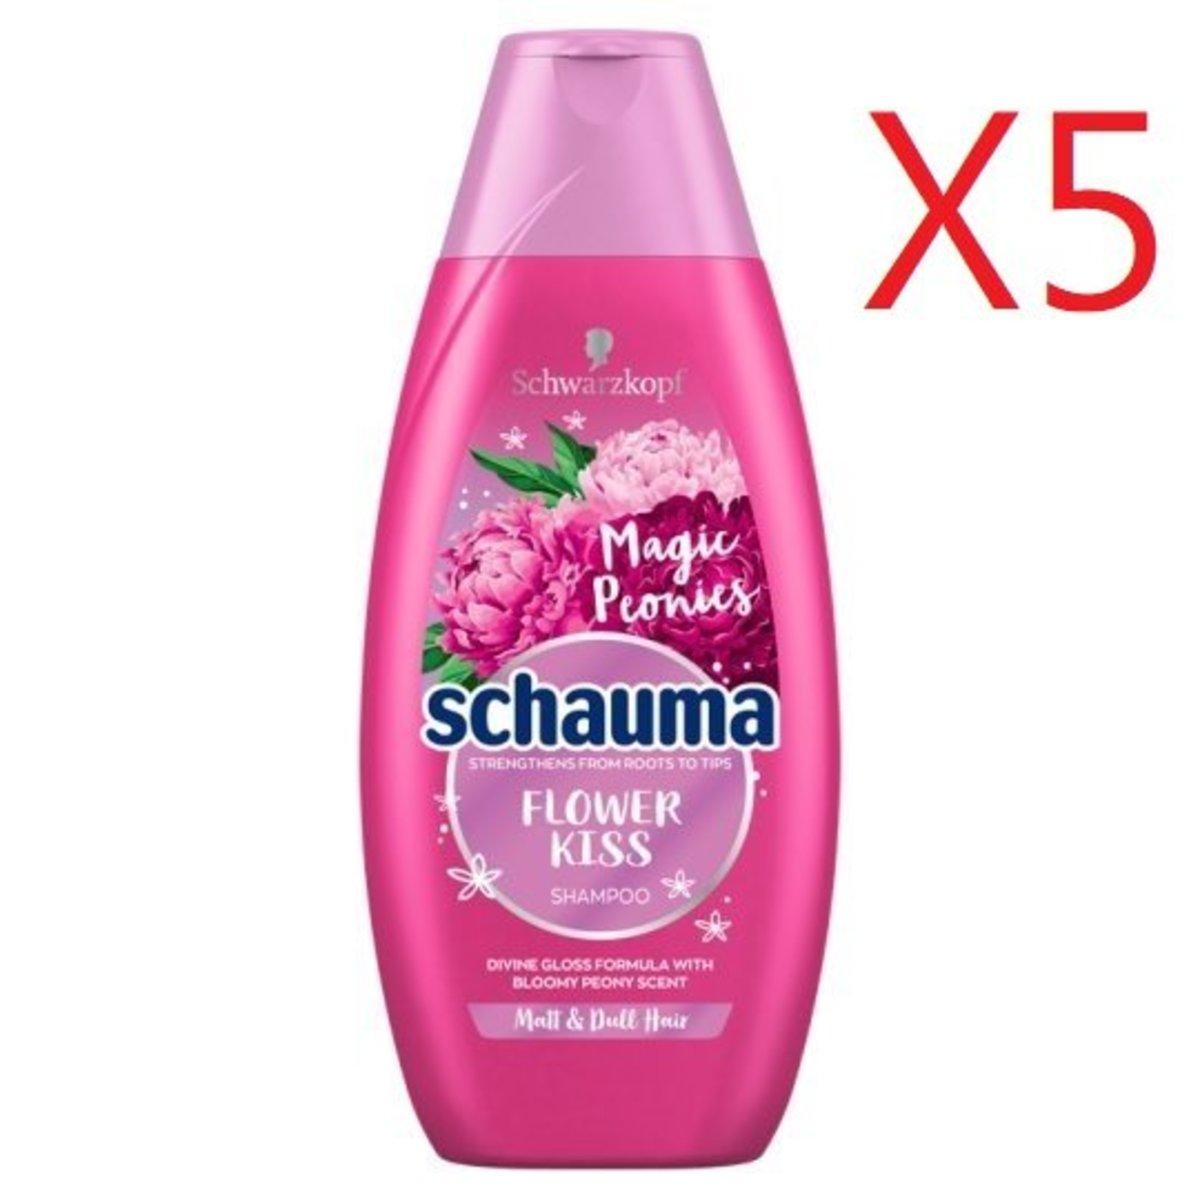 Schauma Flower Kiss Shampoo 400ml - Matt & Dull HairX5pcs  [Parallel Import Product]